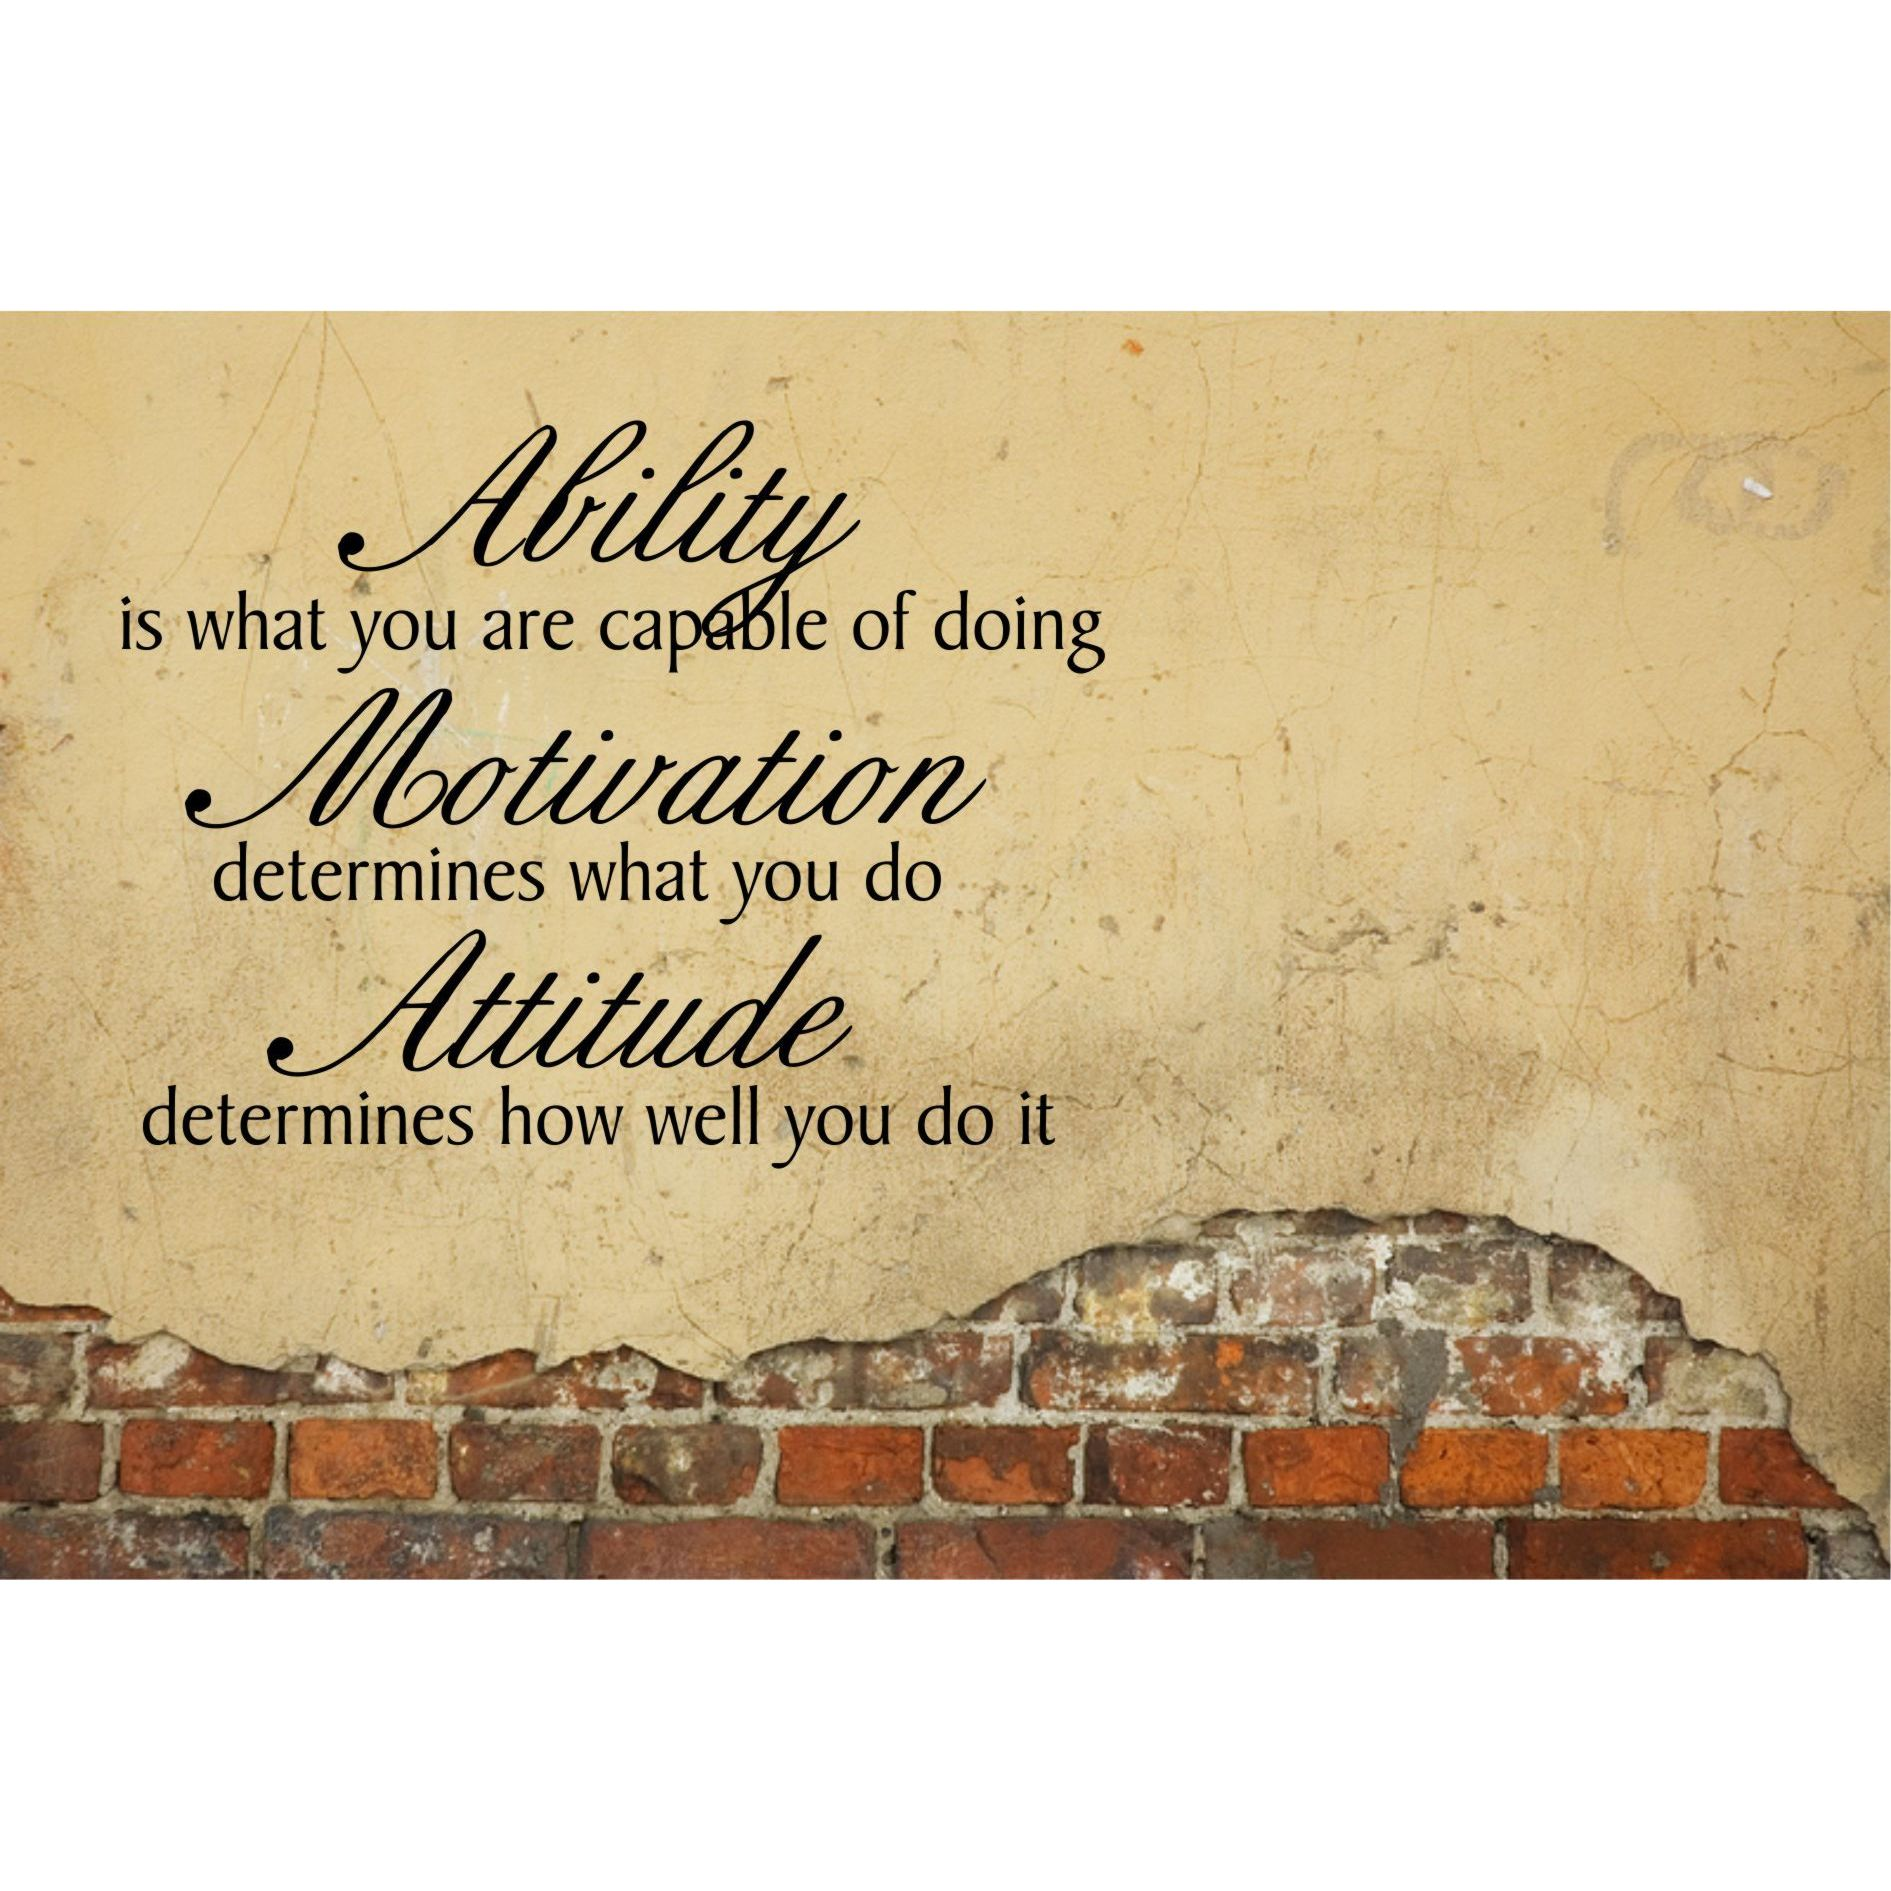 Everything Vinyl Decor Ability, Motivation, Attitude Inspirational Vinyl Wall Artwork by Overstock